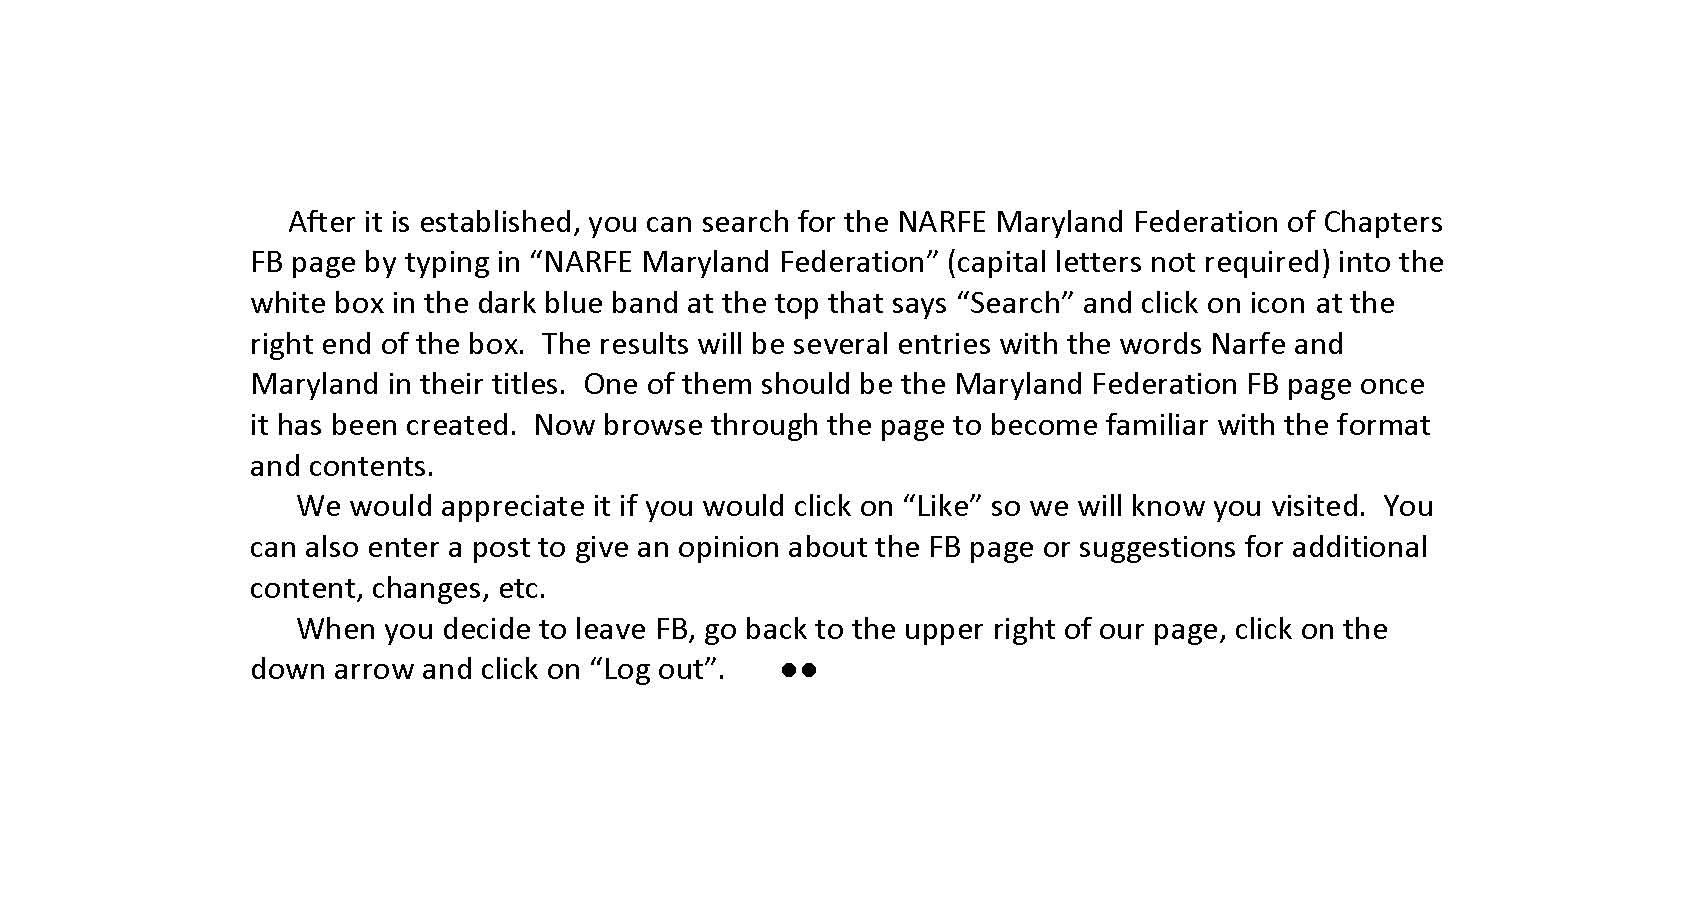 NARFE Maryland Federation FB page3-CROPPED